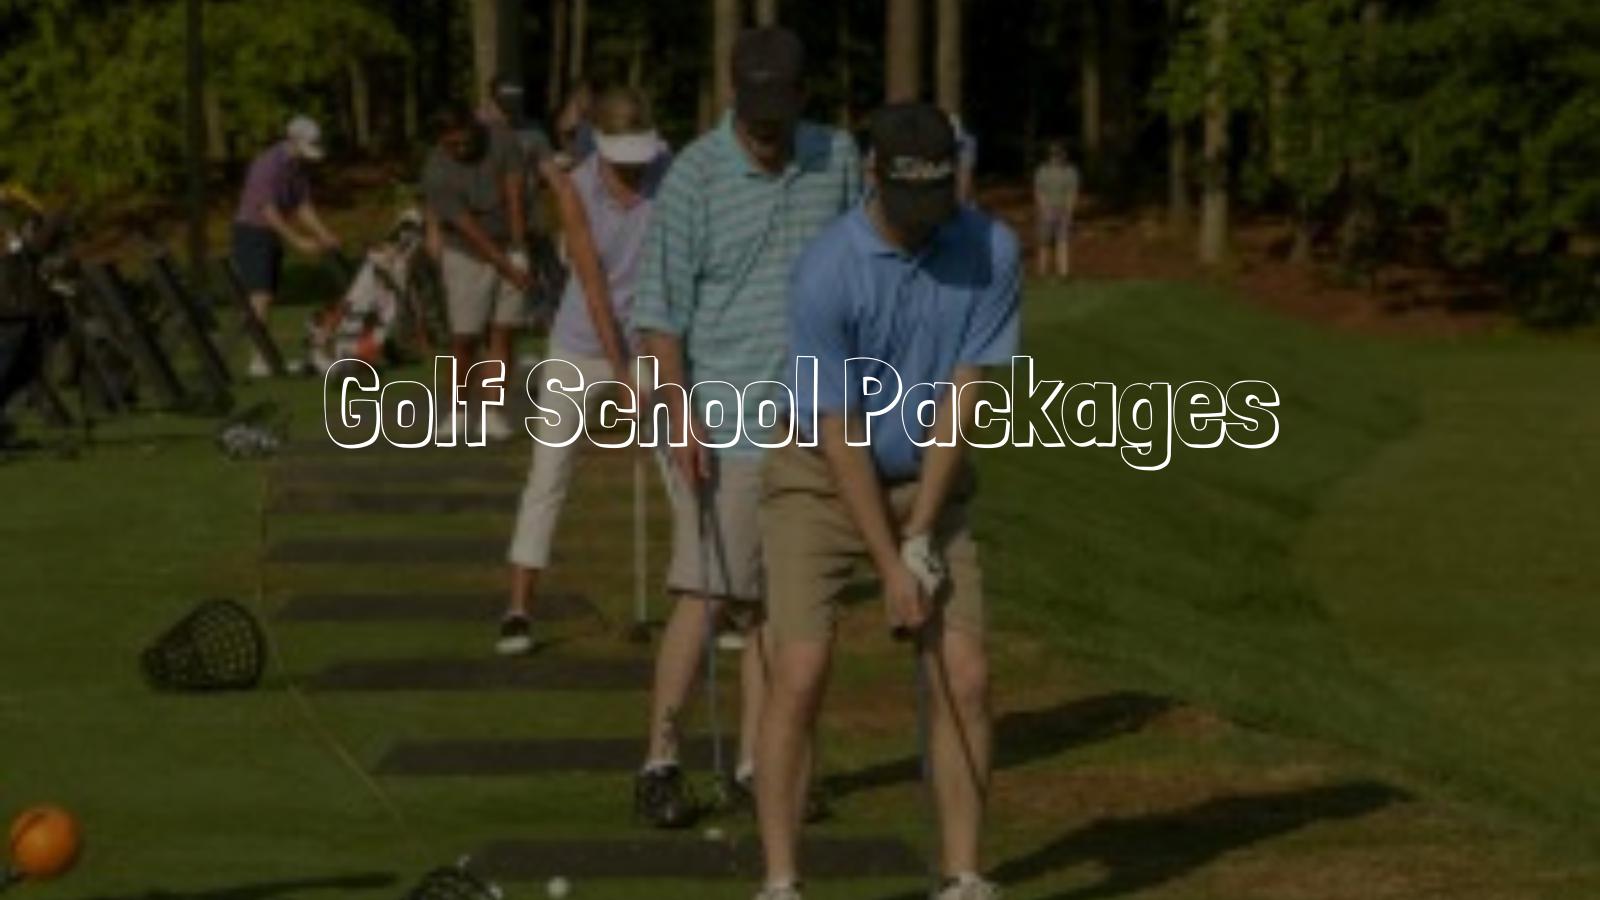 Golf School Packages